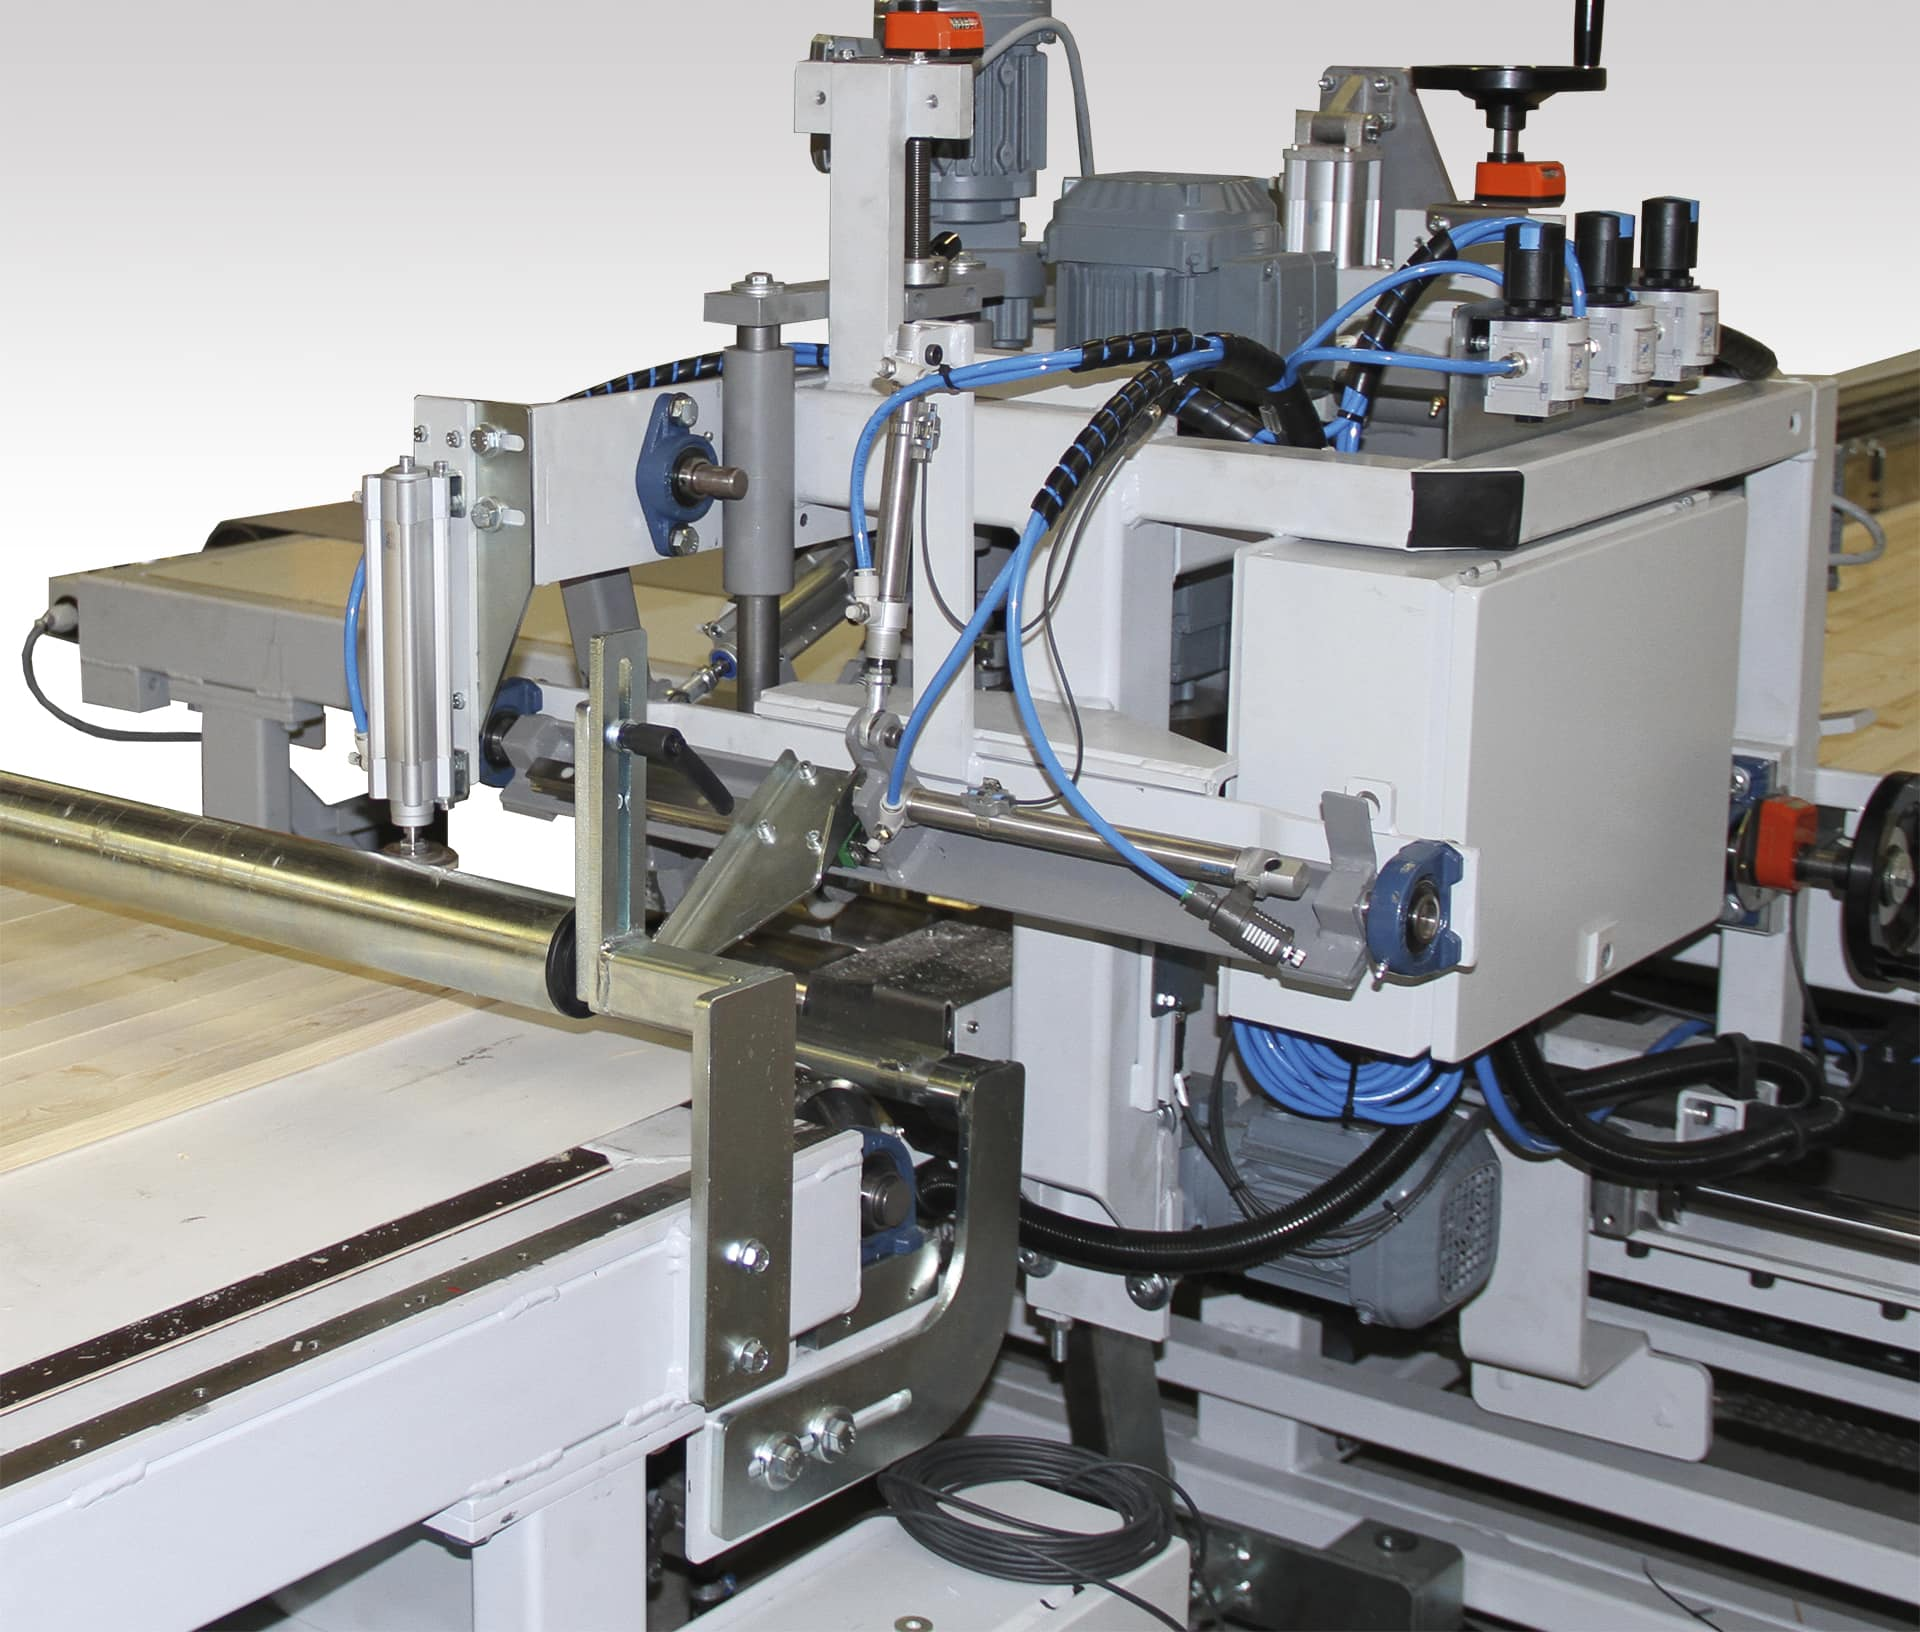 Press Press Cardi B : chorus press, press, press, press